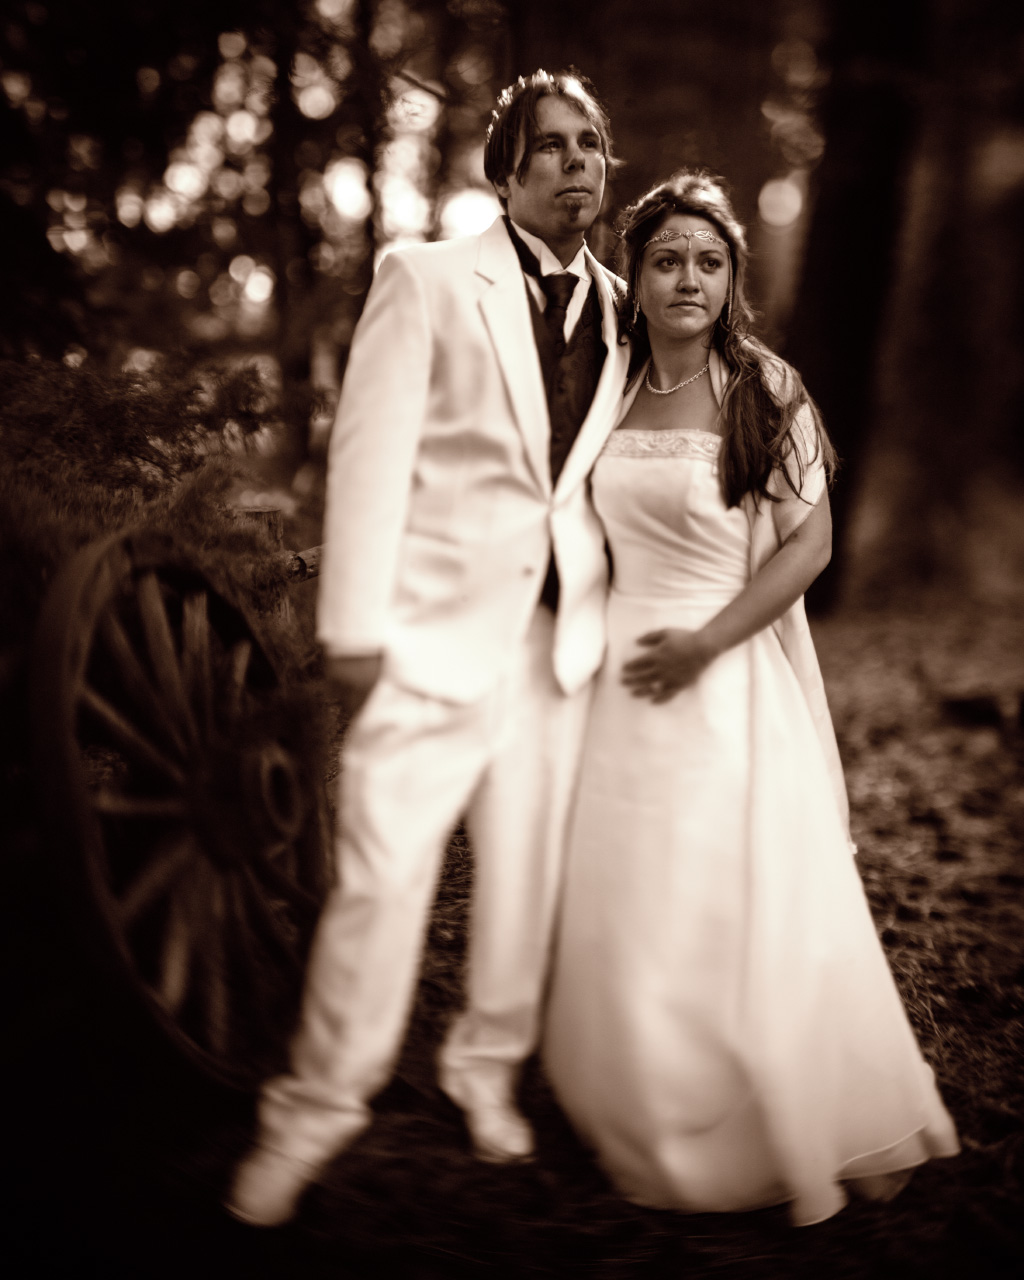 Wedding by NickSpiker